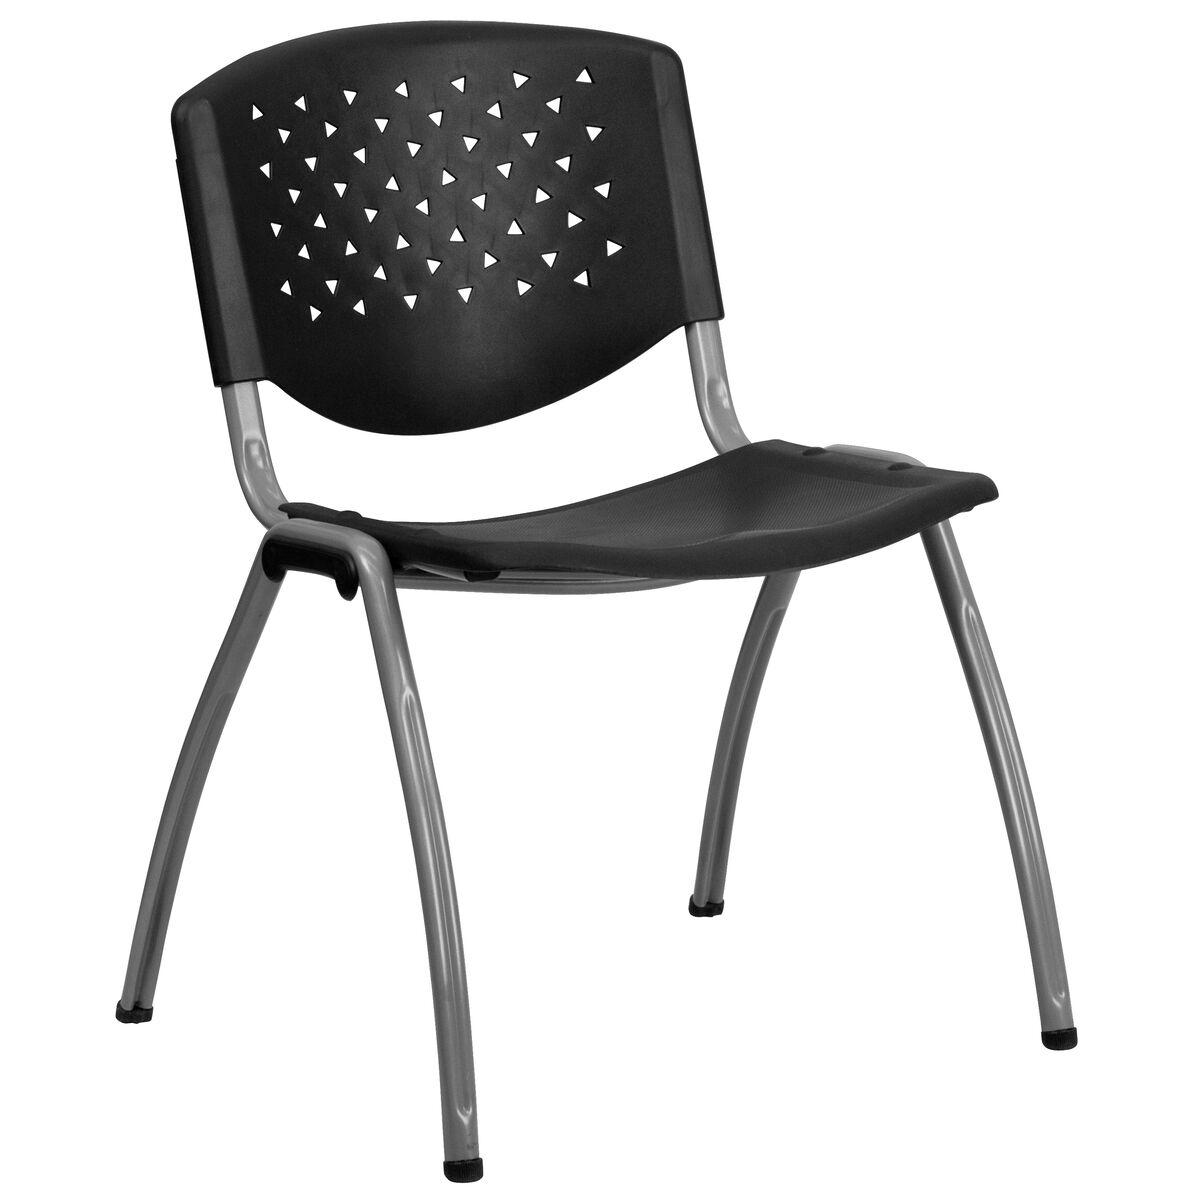 Black Plastic Stack Chair Rut F01a Bk Gg